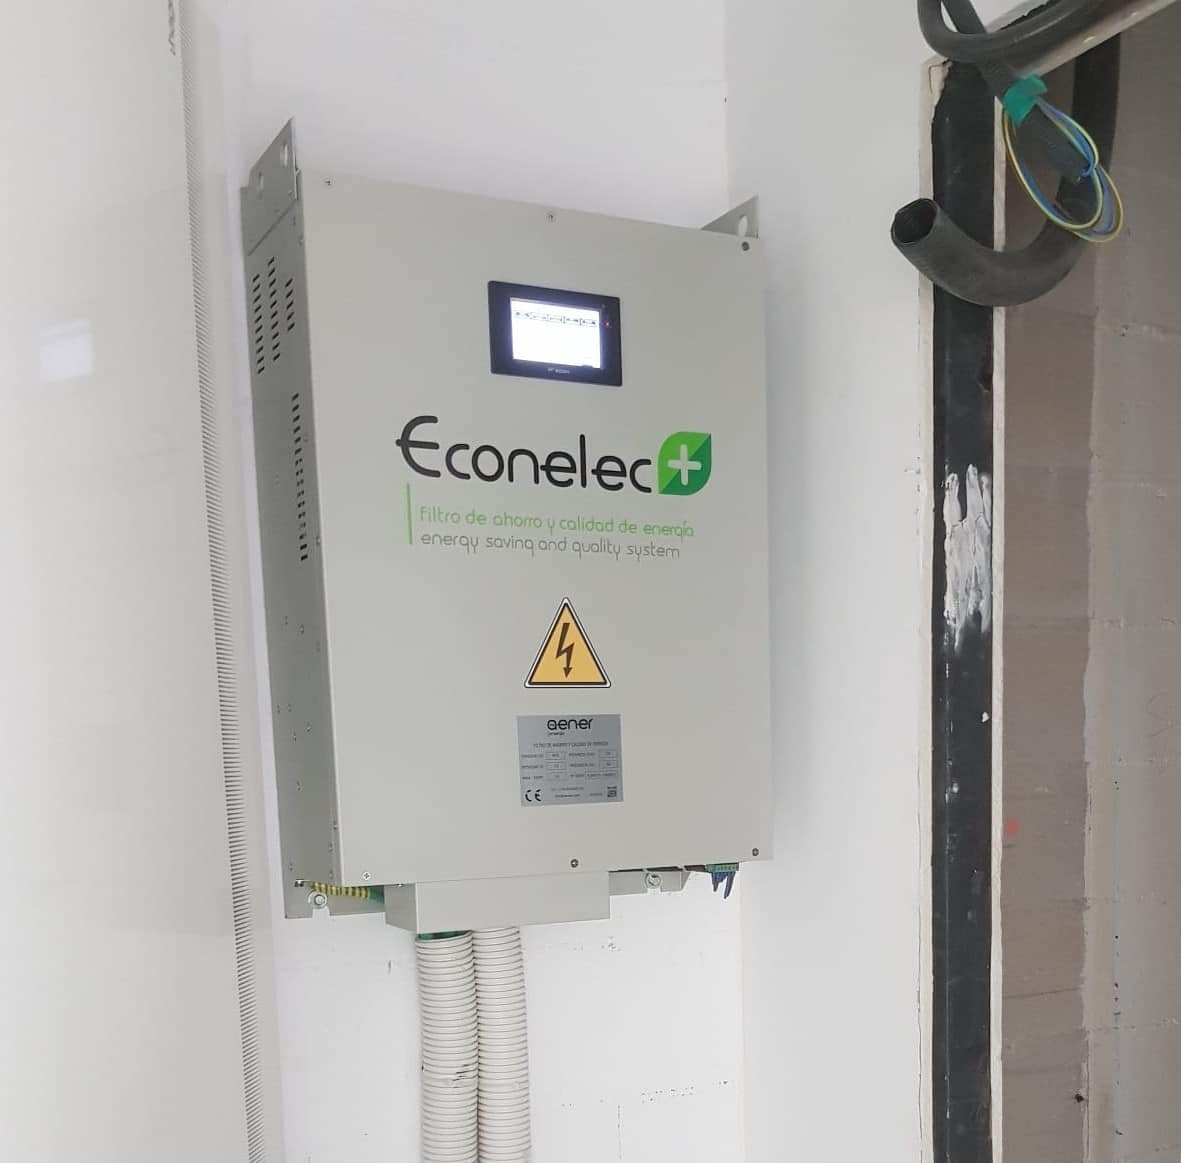 https://www.energybox-e.com/wp-content/uploads/2020/05/econelec-75-1.jpg